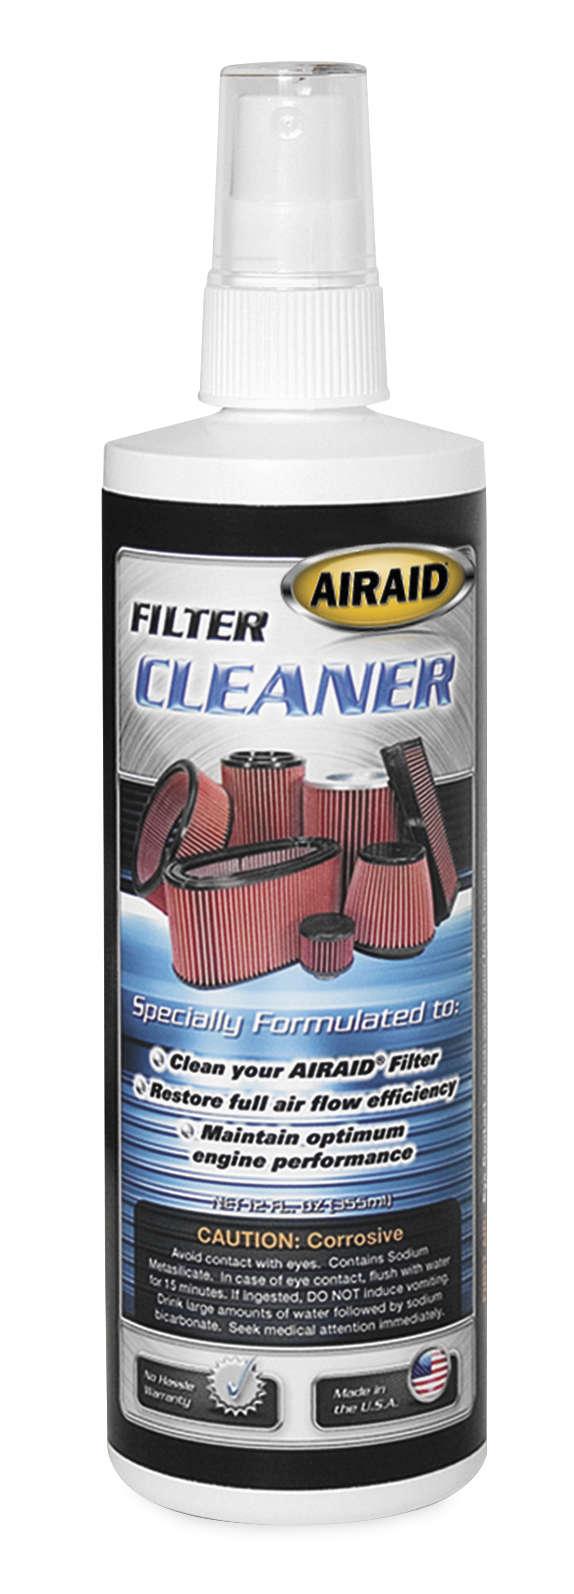 AIRAID FILTERS Air Filter Cleaner